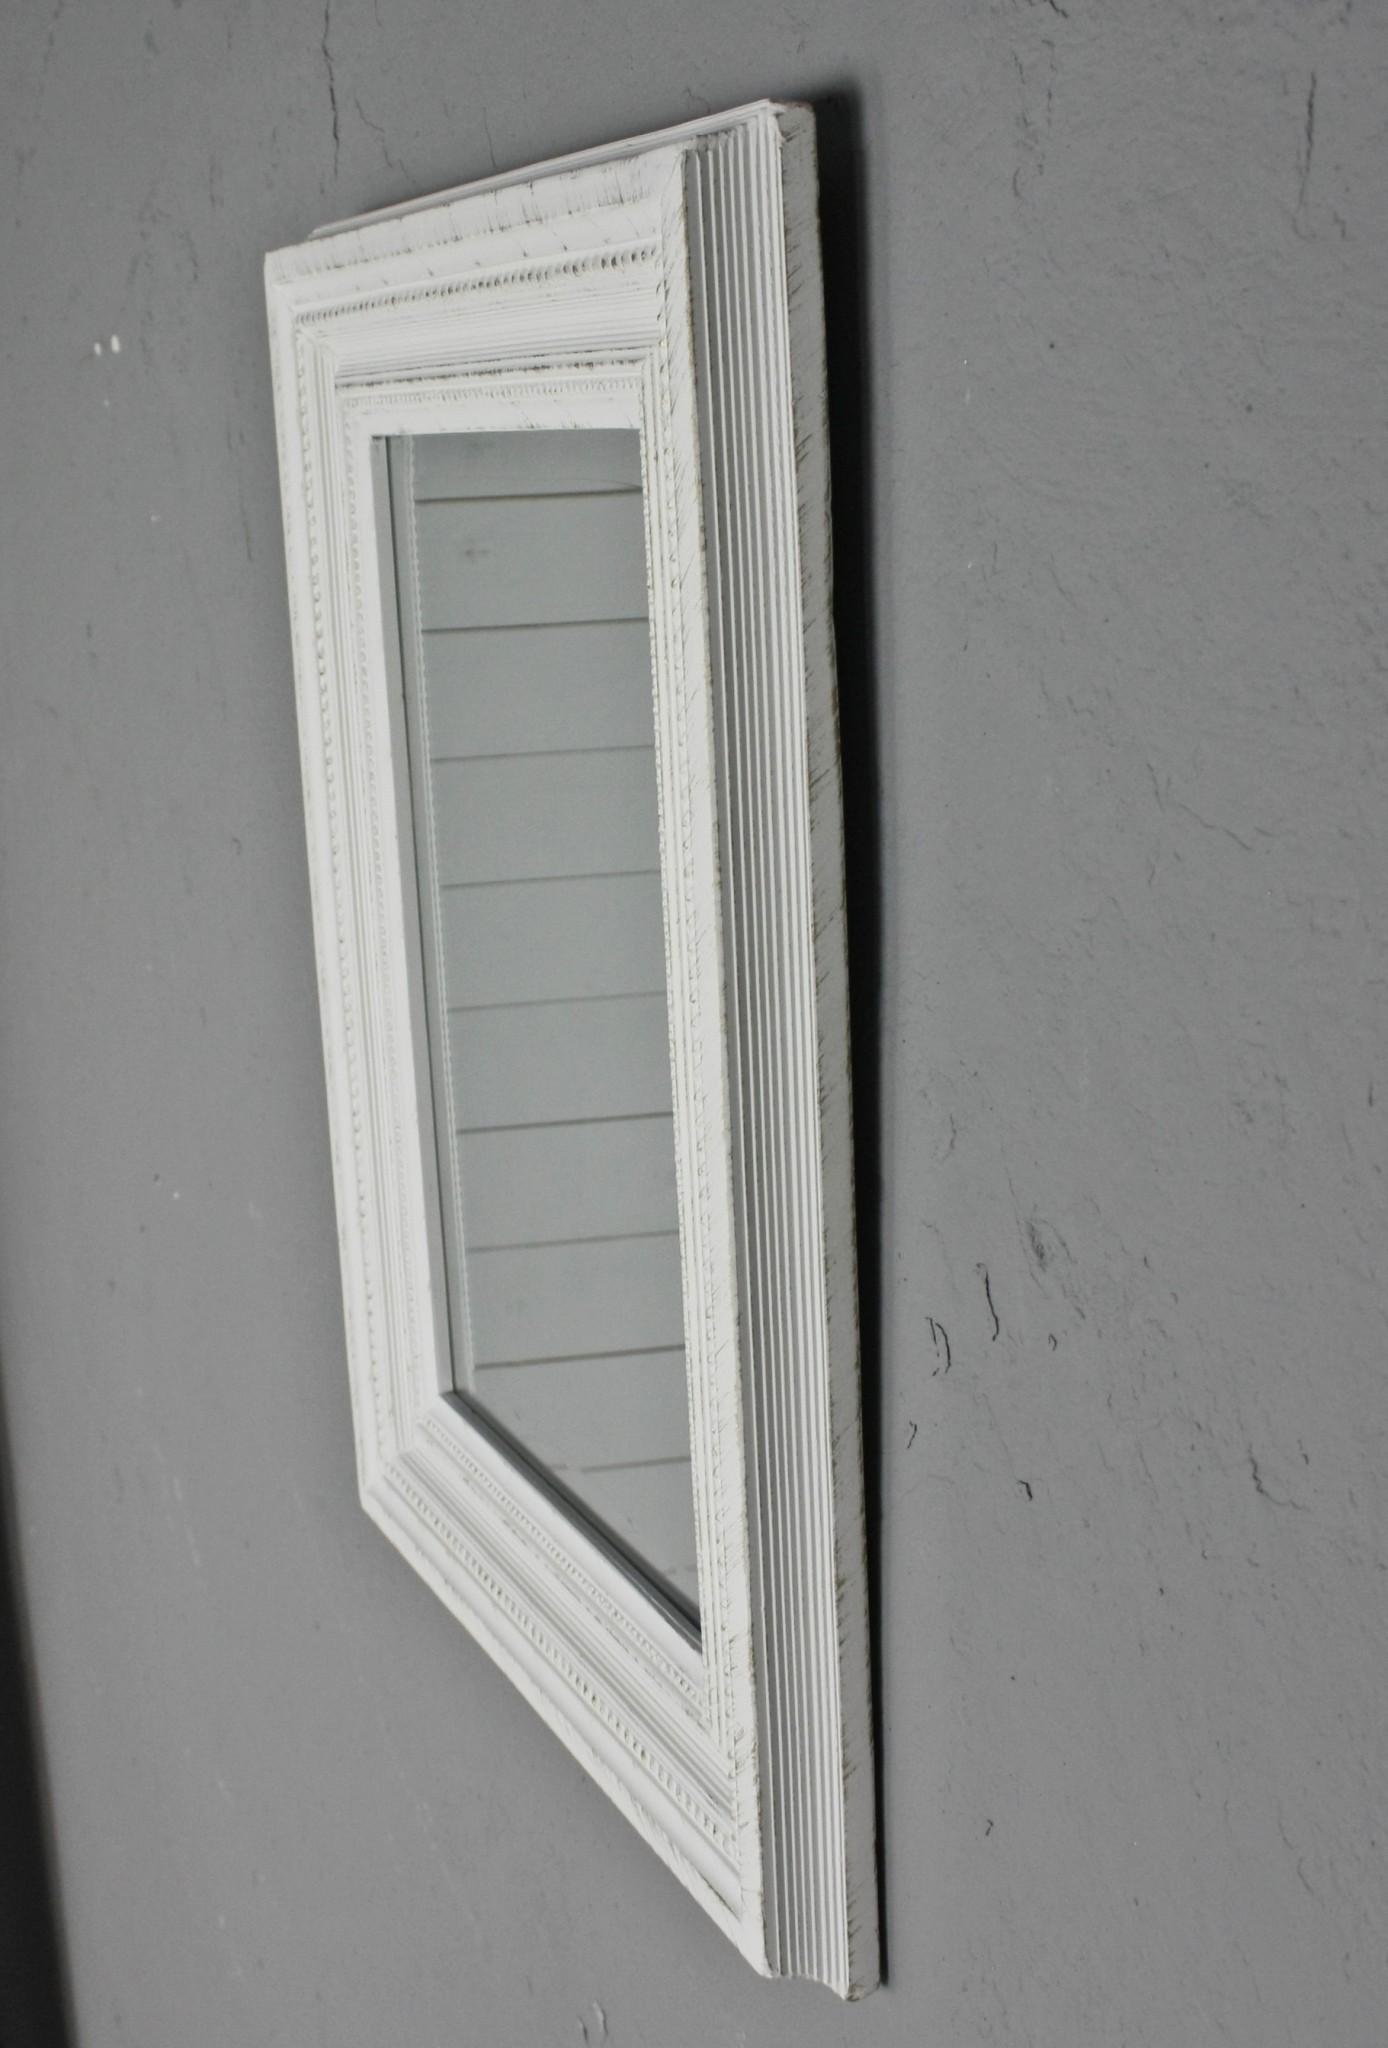 spiegel wei antik 45x35 cm holz neu wandspiegel barock badspiegel landhaus ebay. Black Bedroom Furniture Sets. Home Design Ideas